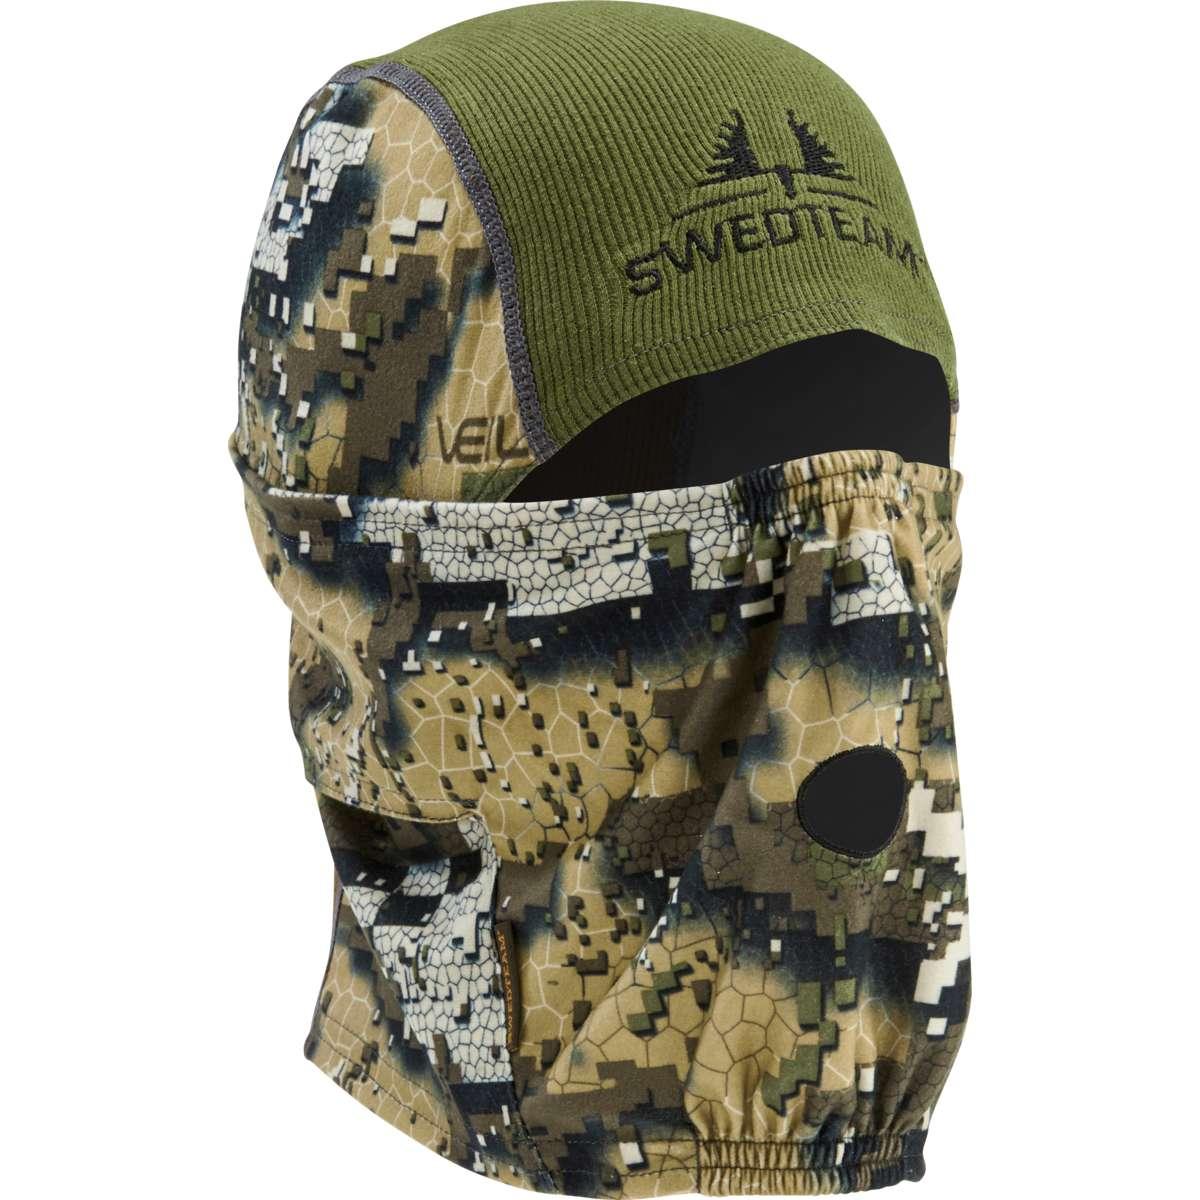 Swedteam Veil Hood